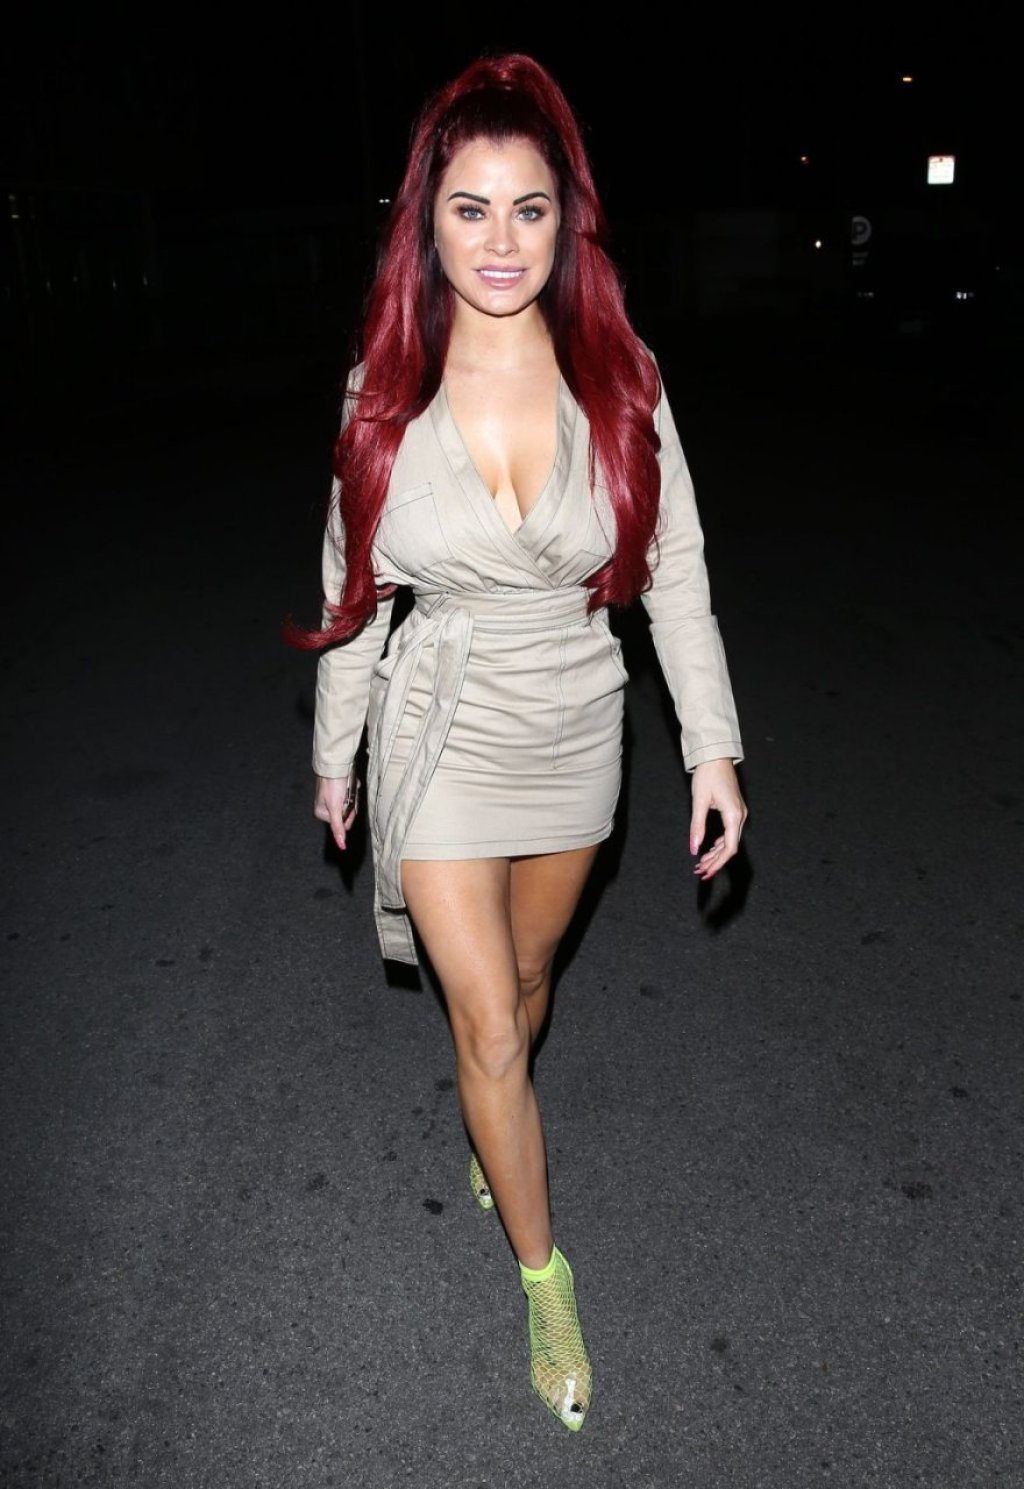 Carla Howe Sexy (40 Photos)